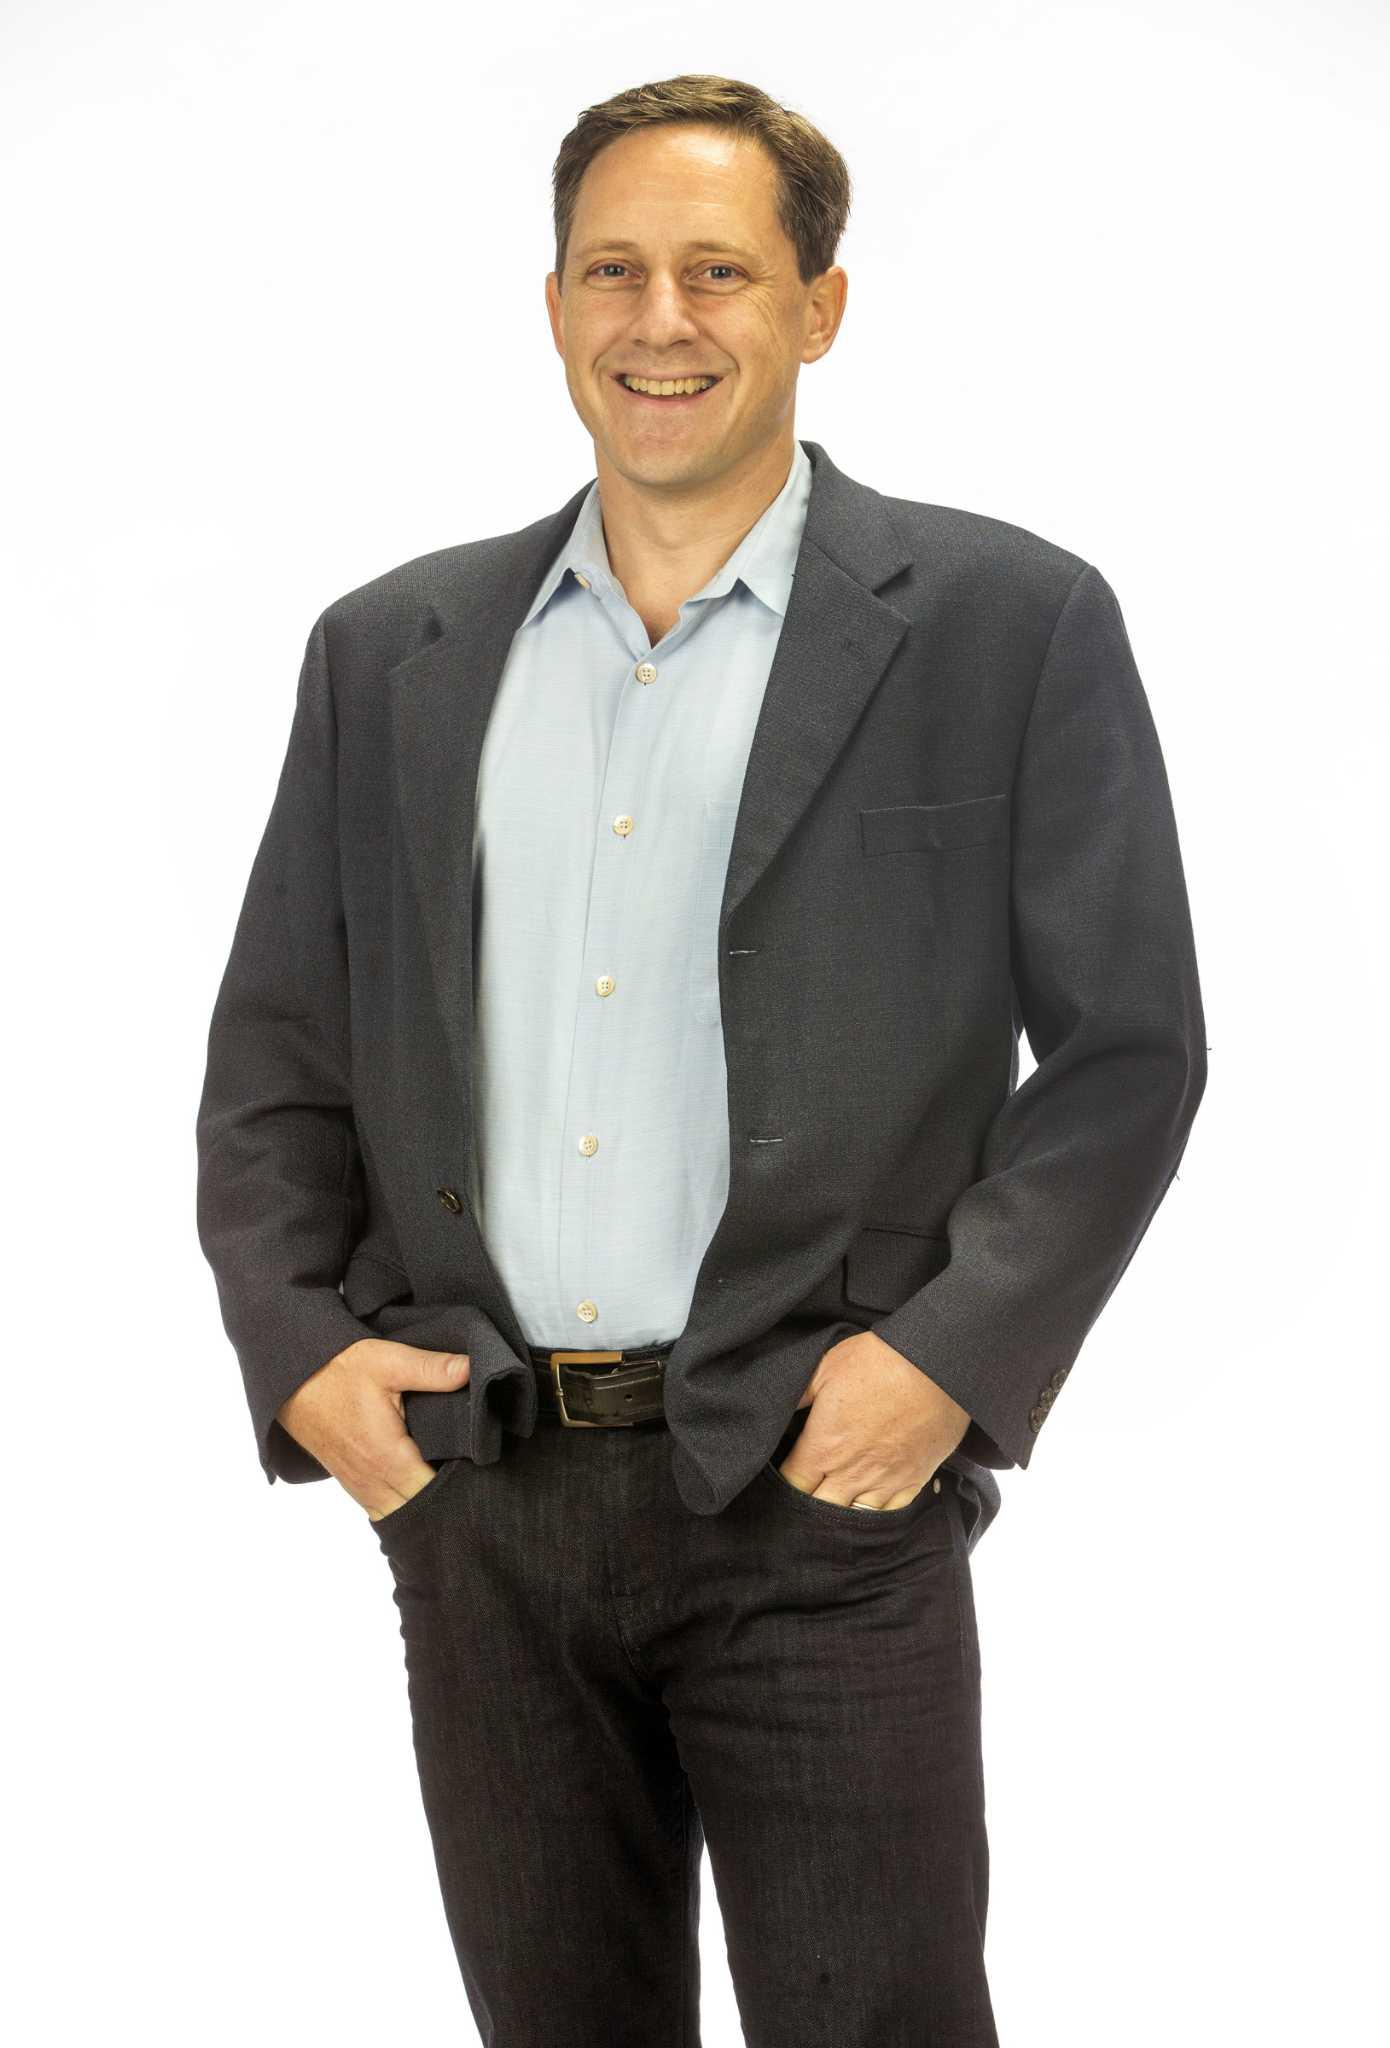 Jim Warner, PE - Walker Parking Consulting